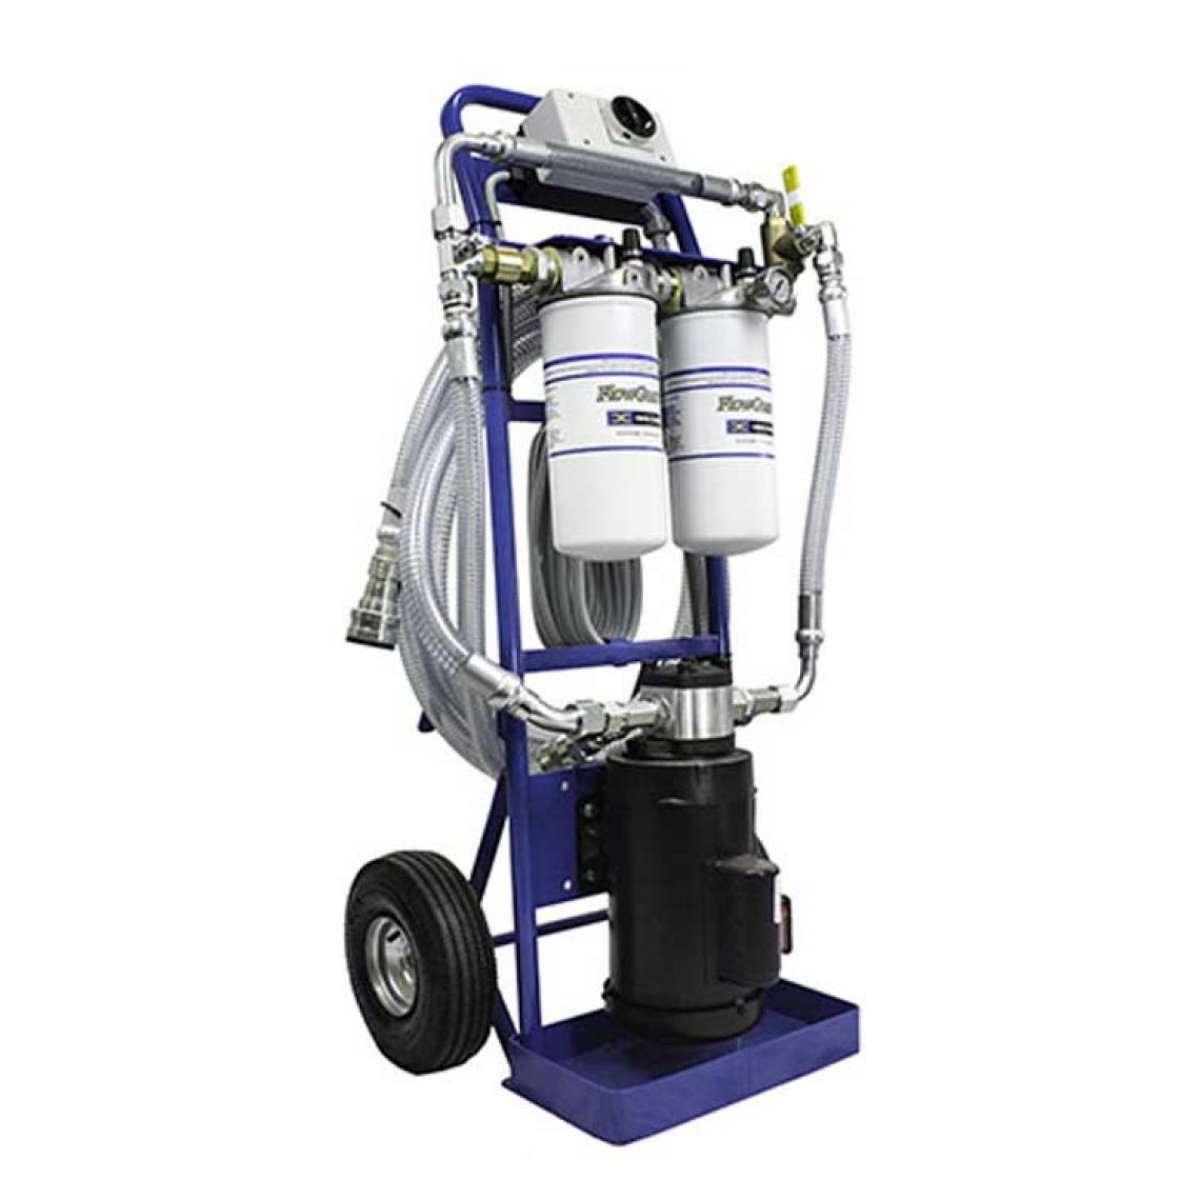 FlowGuard Filter Cart - 2 gpm pump  1 hp electric motor 115 vac, 60 hz,1725 rpms,13 amps